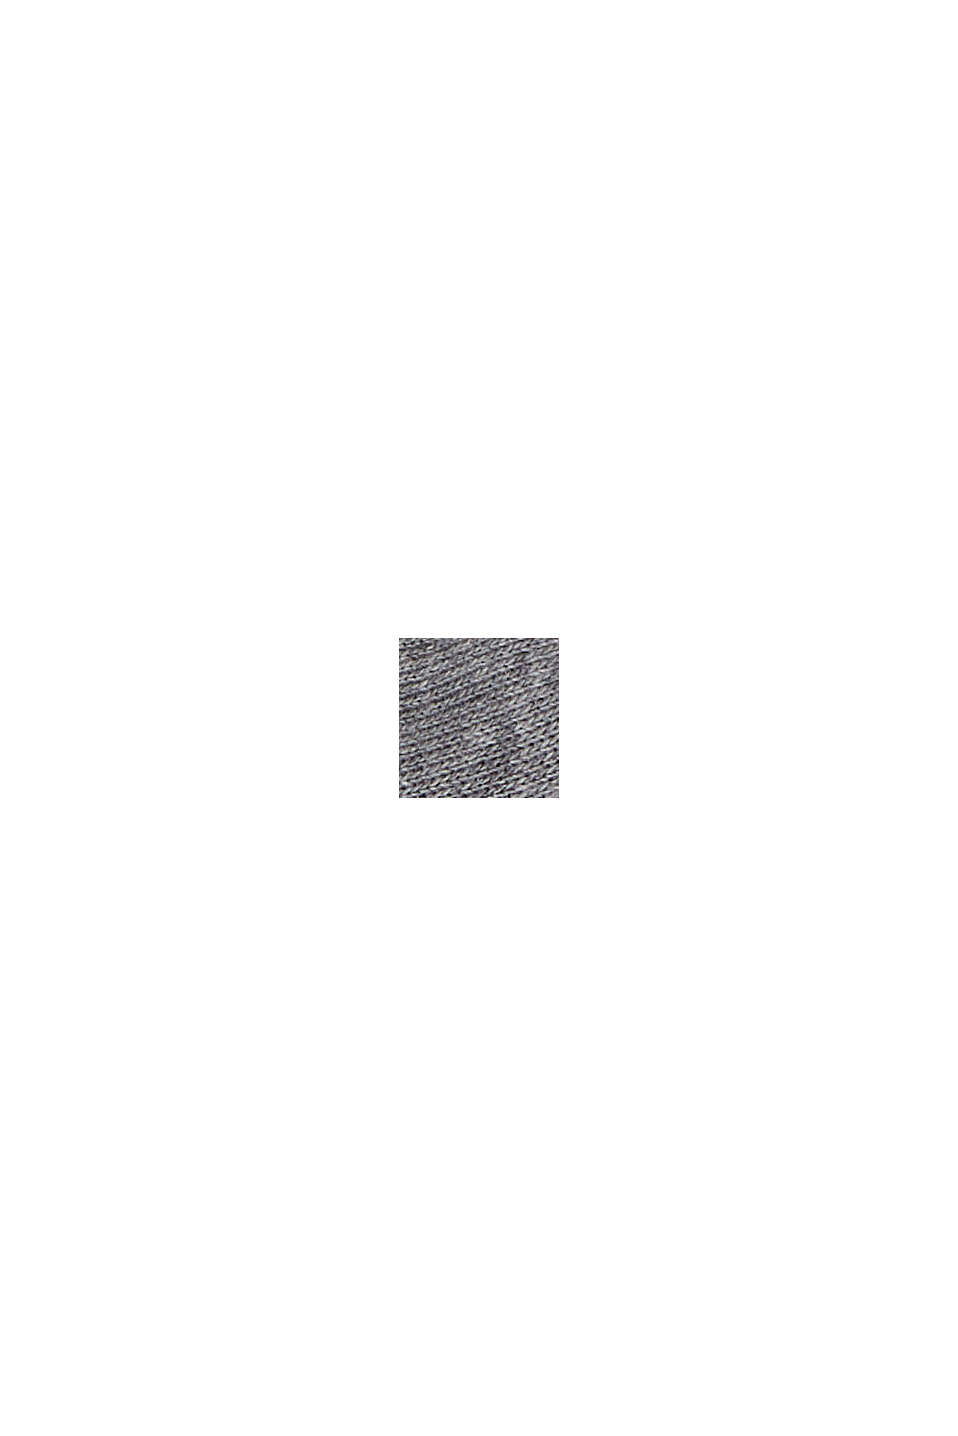 2er-Pack Sneaker-Socken aus Baumwoll-Mesh, GREY, swatch